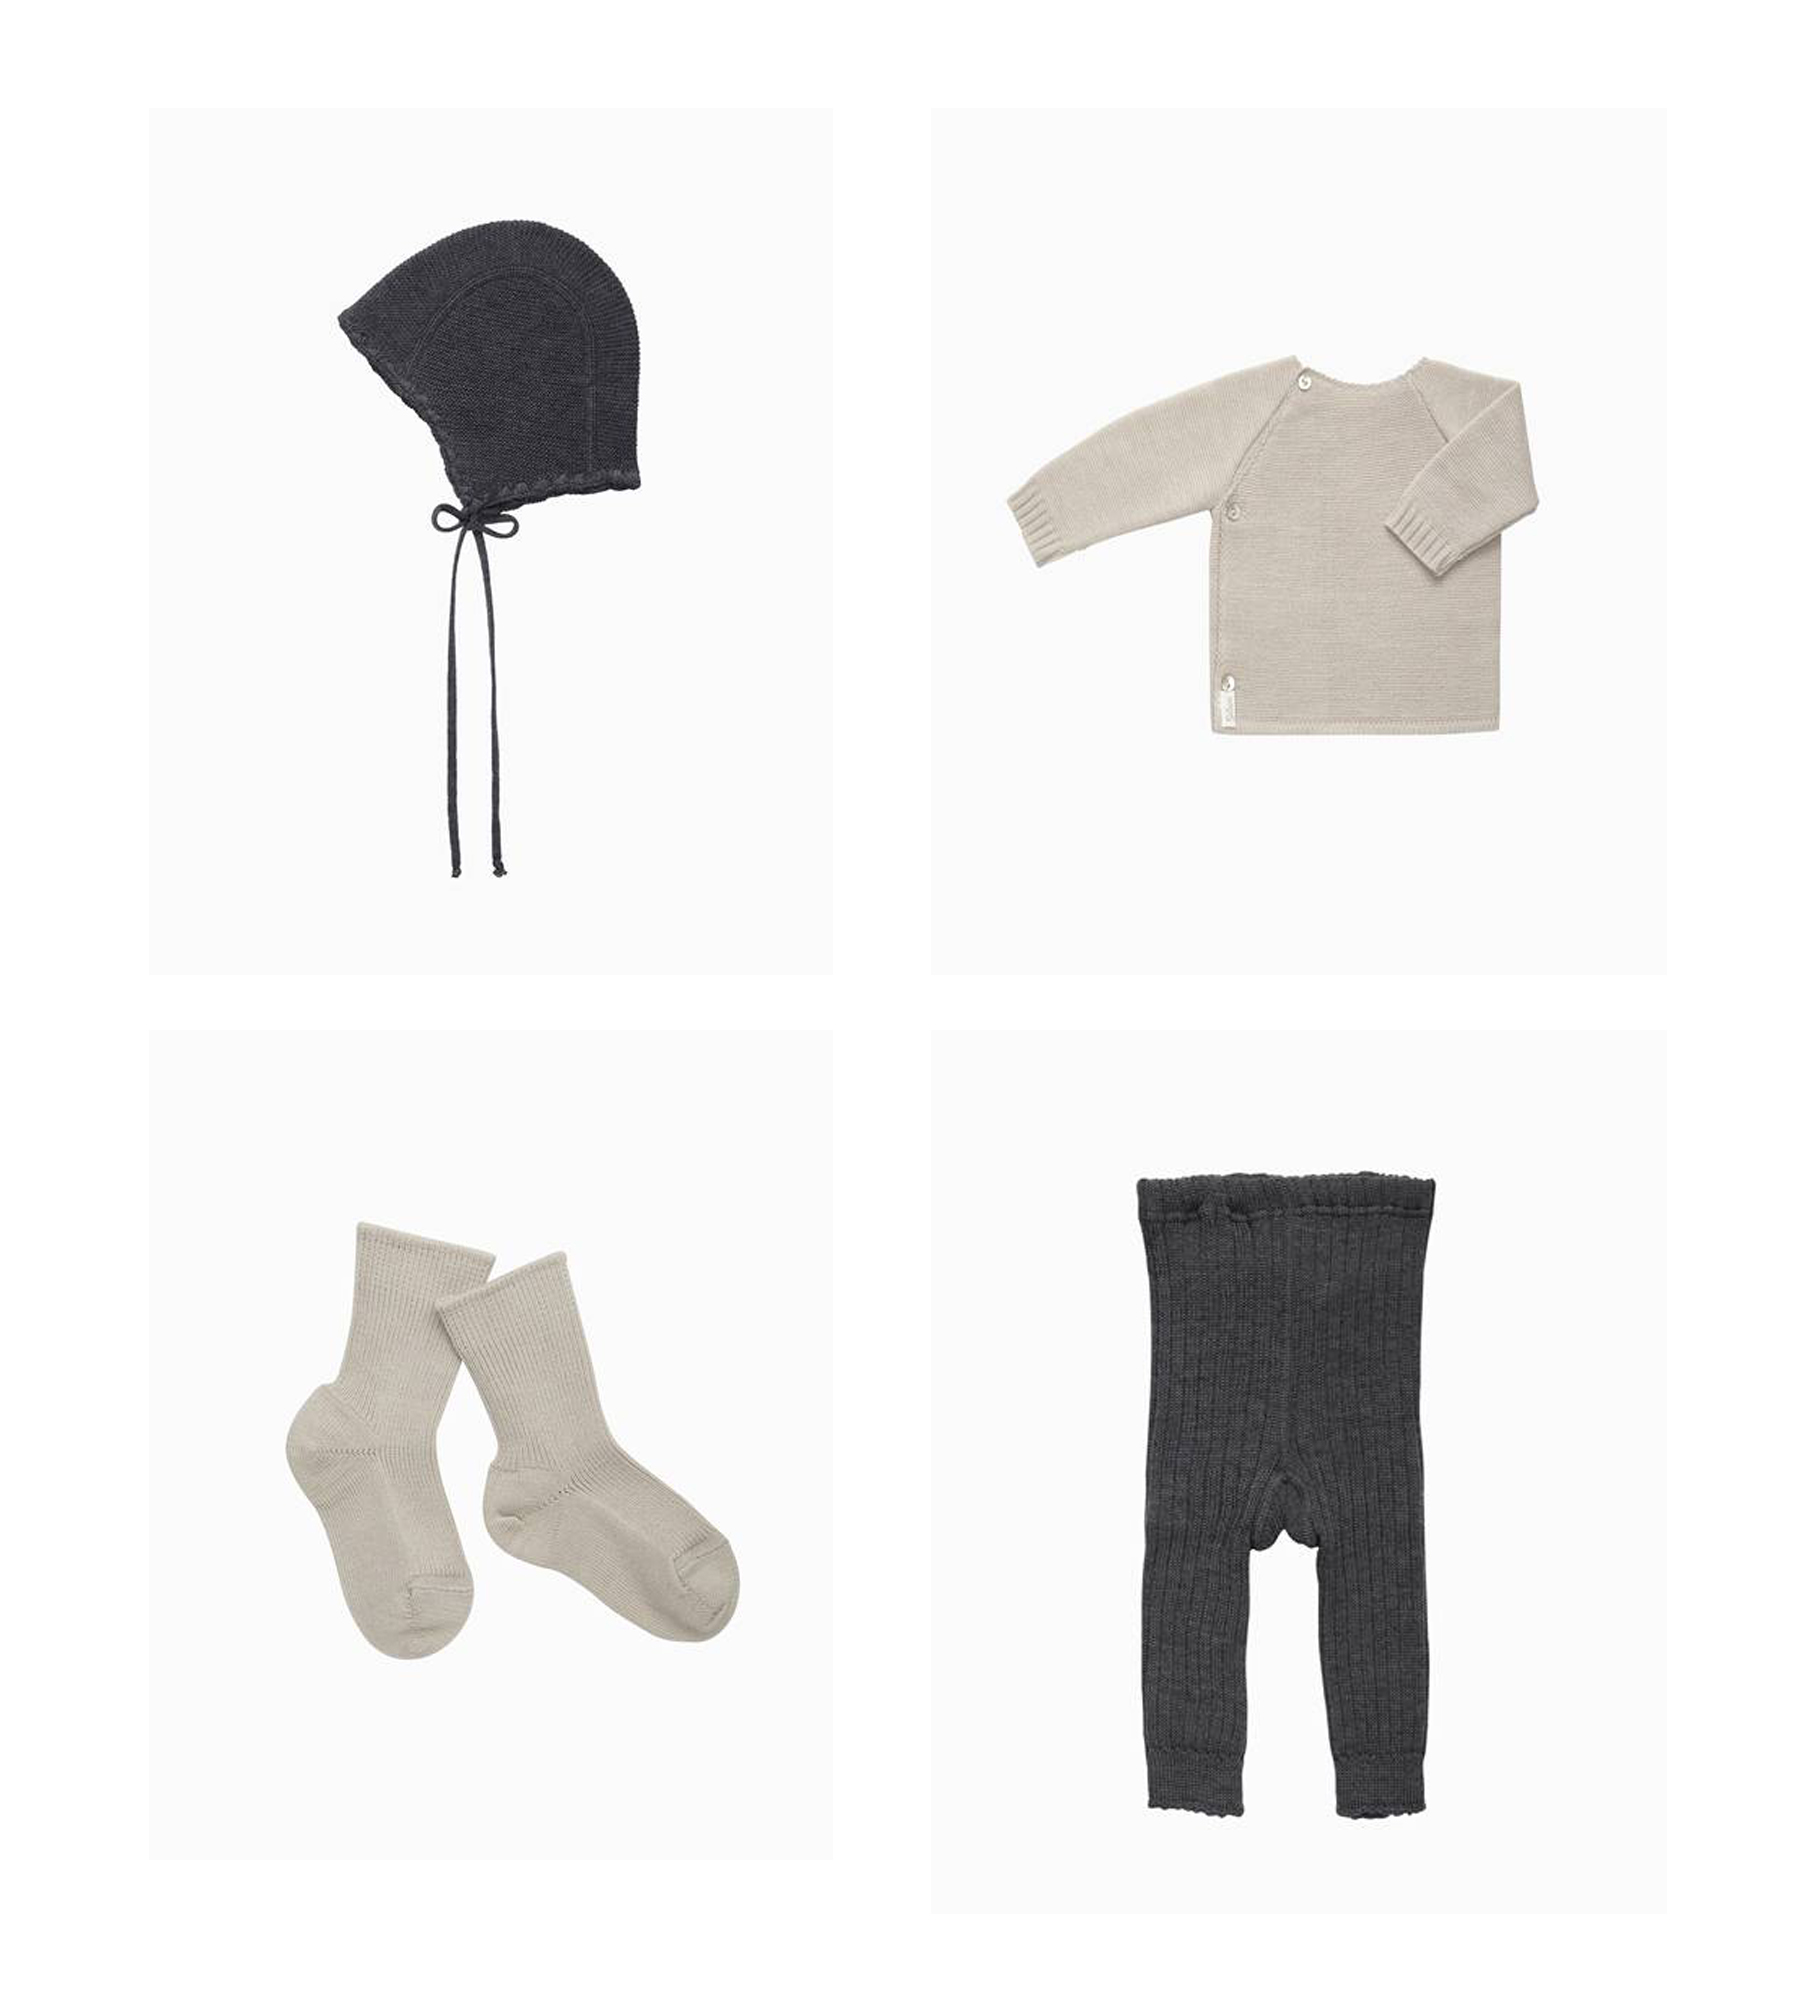 Baby hat// SELANA  Socks// SELANA  Blouse// SELANA  Leggings// SELANA